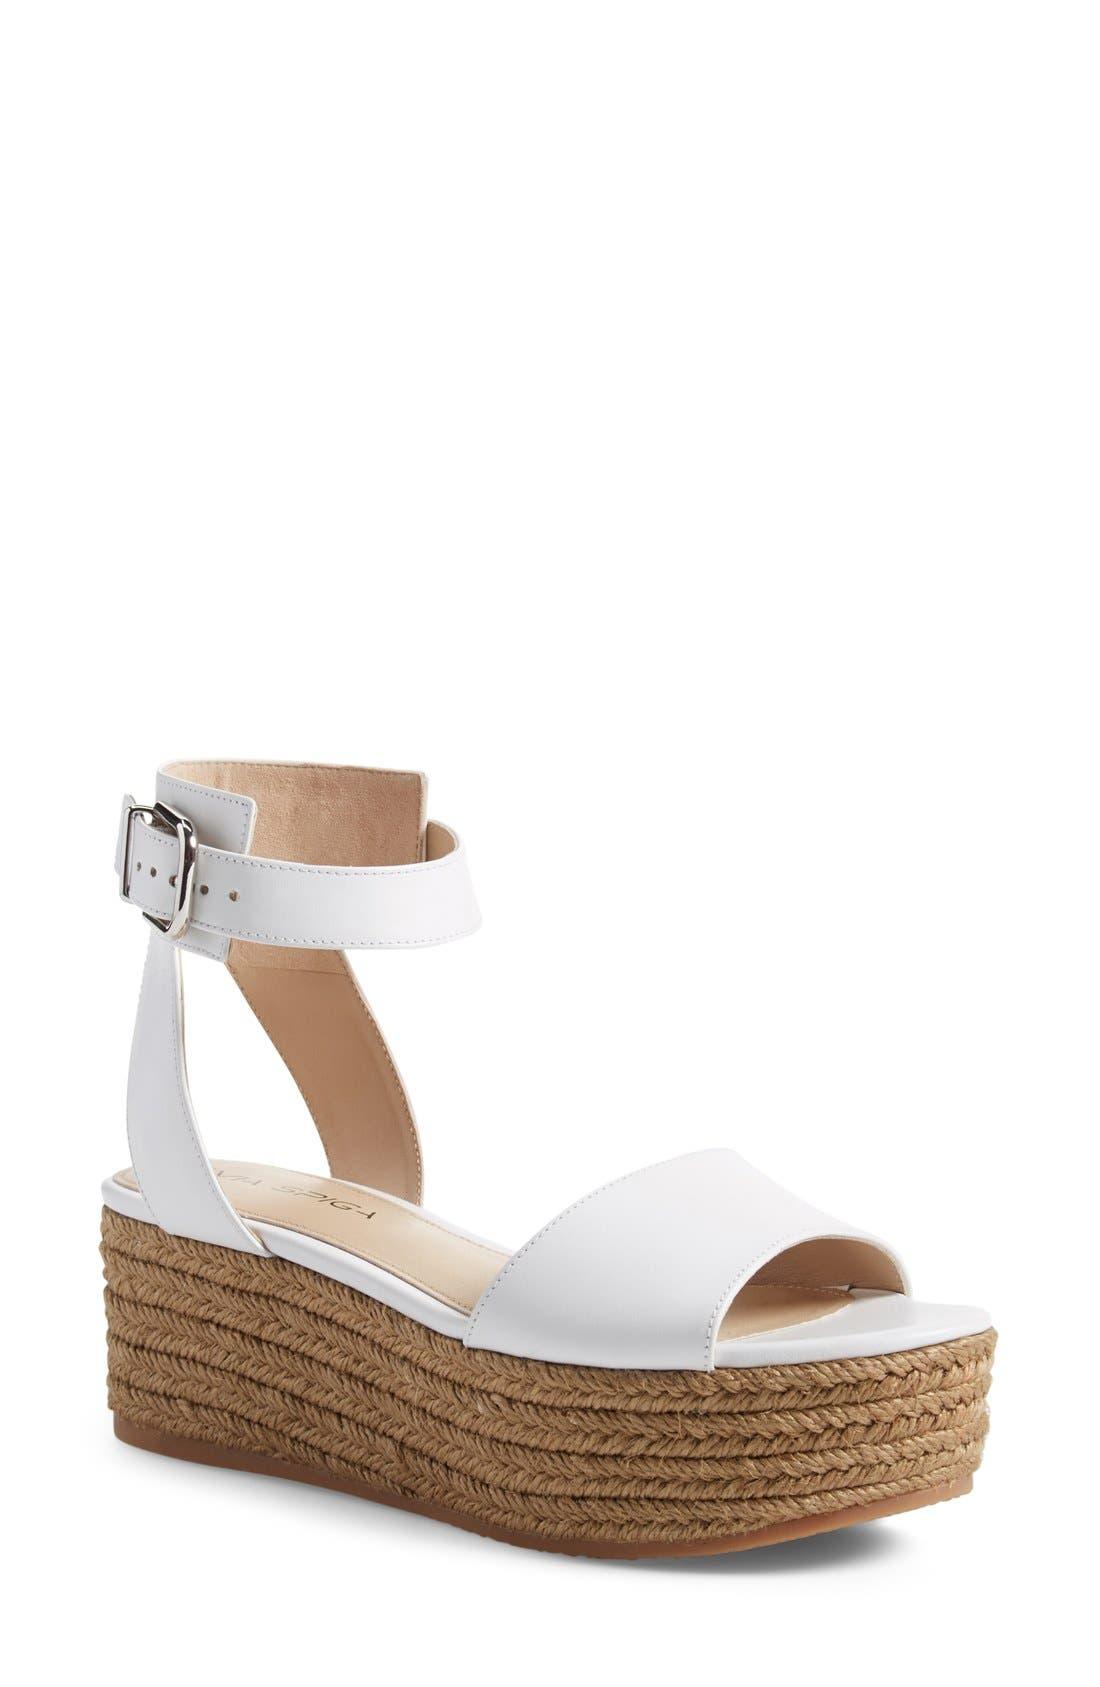 Main Image - Via Spiga 'Nemy' Platform Sandal (Women)